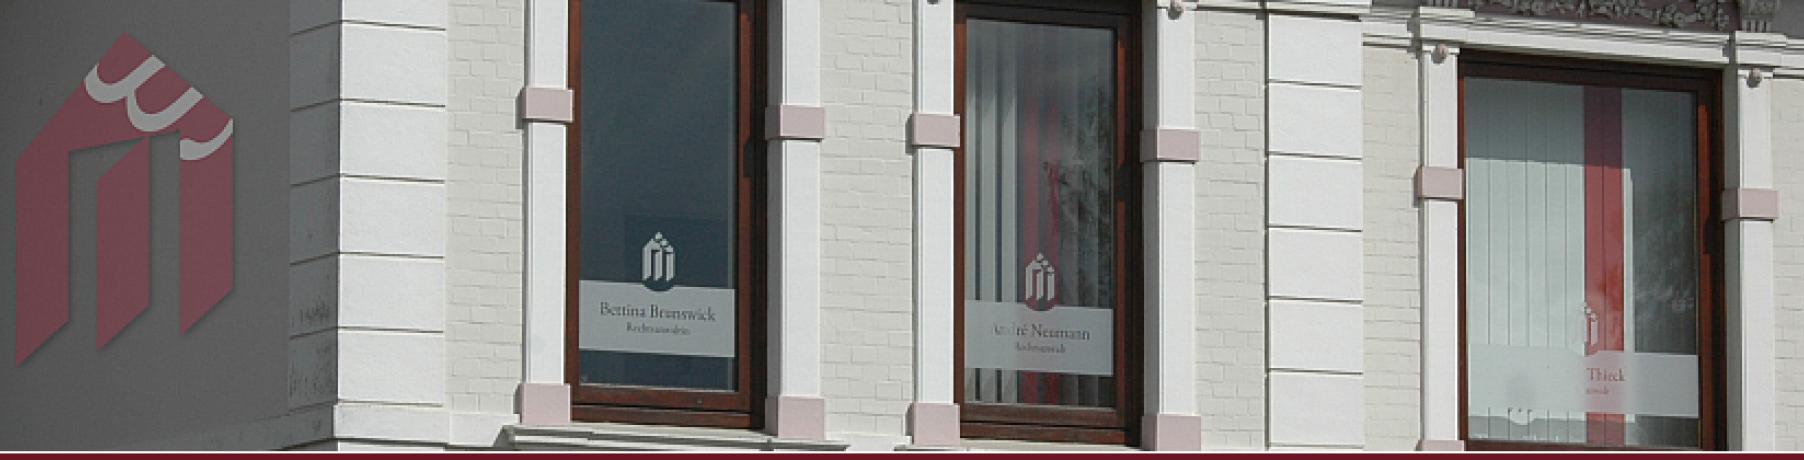 Rechtsanwältin Brunswick im Anwaltshaus in Wedel